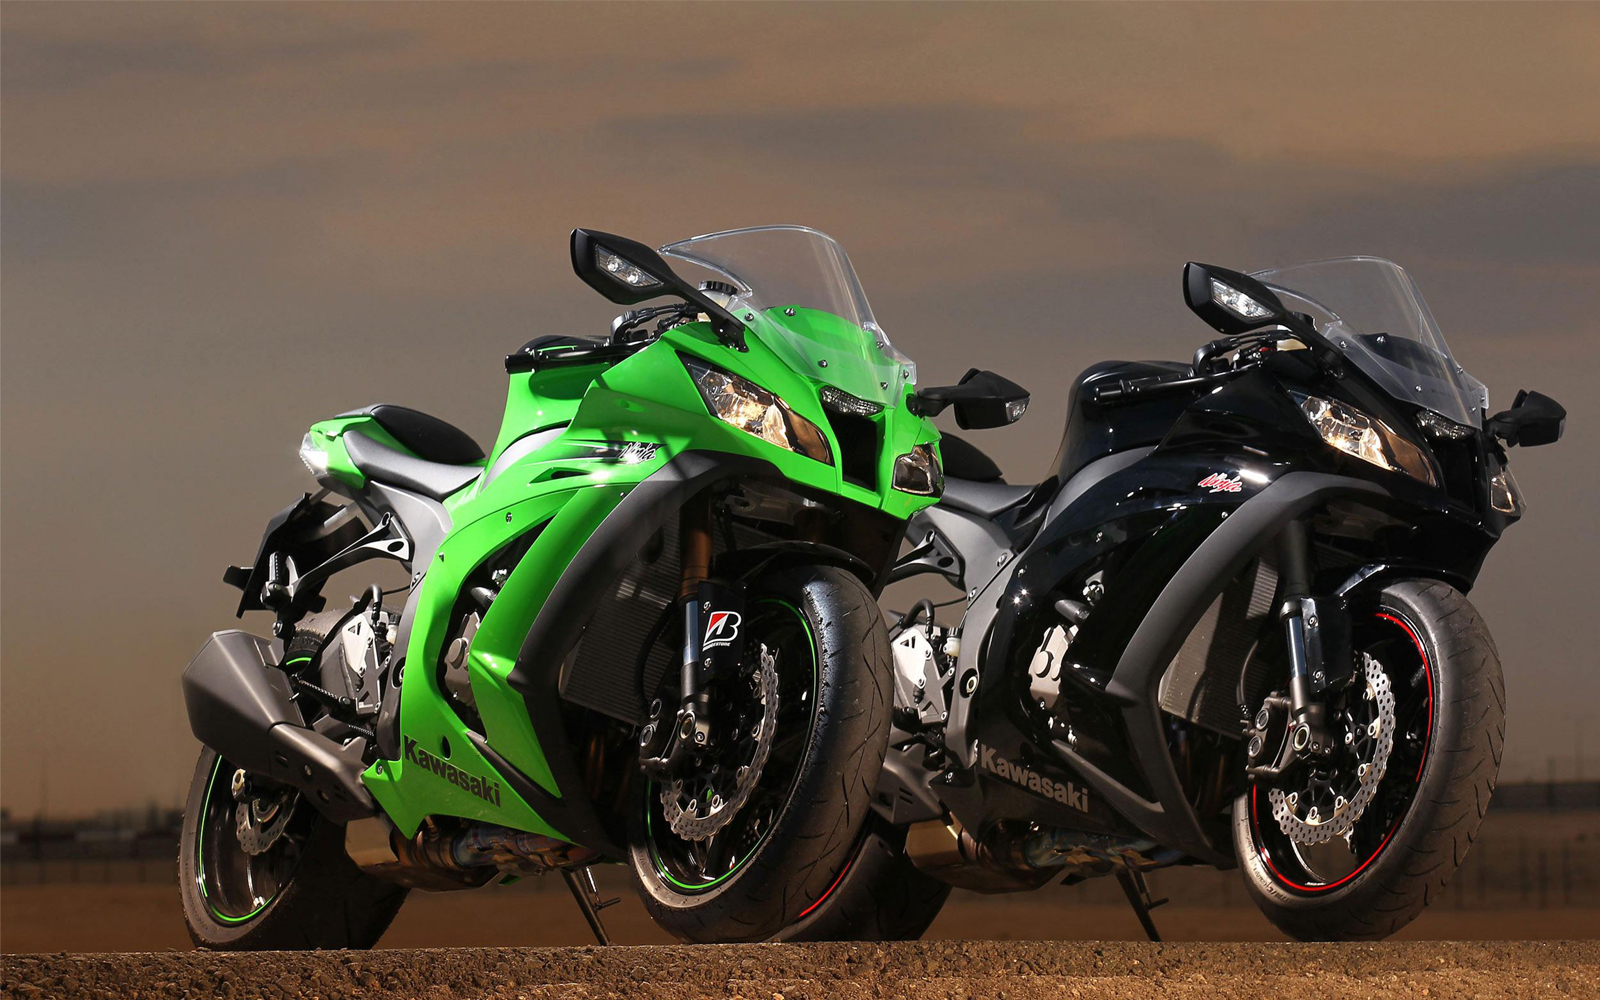 http://4.bp.blogspot.com/-OyX3Mv5uB5A/ULs77e_cCEI/AAAAAAAAXkI/XnFTTr70_ME/s1600/Kawasaki+Ninja+ZX-10R+19.jpg